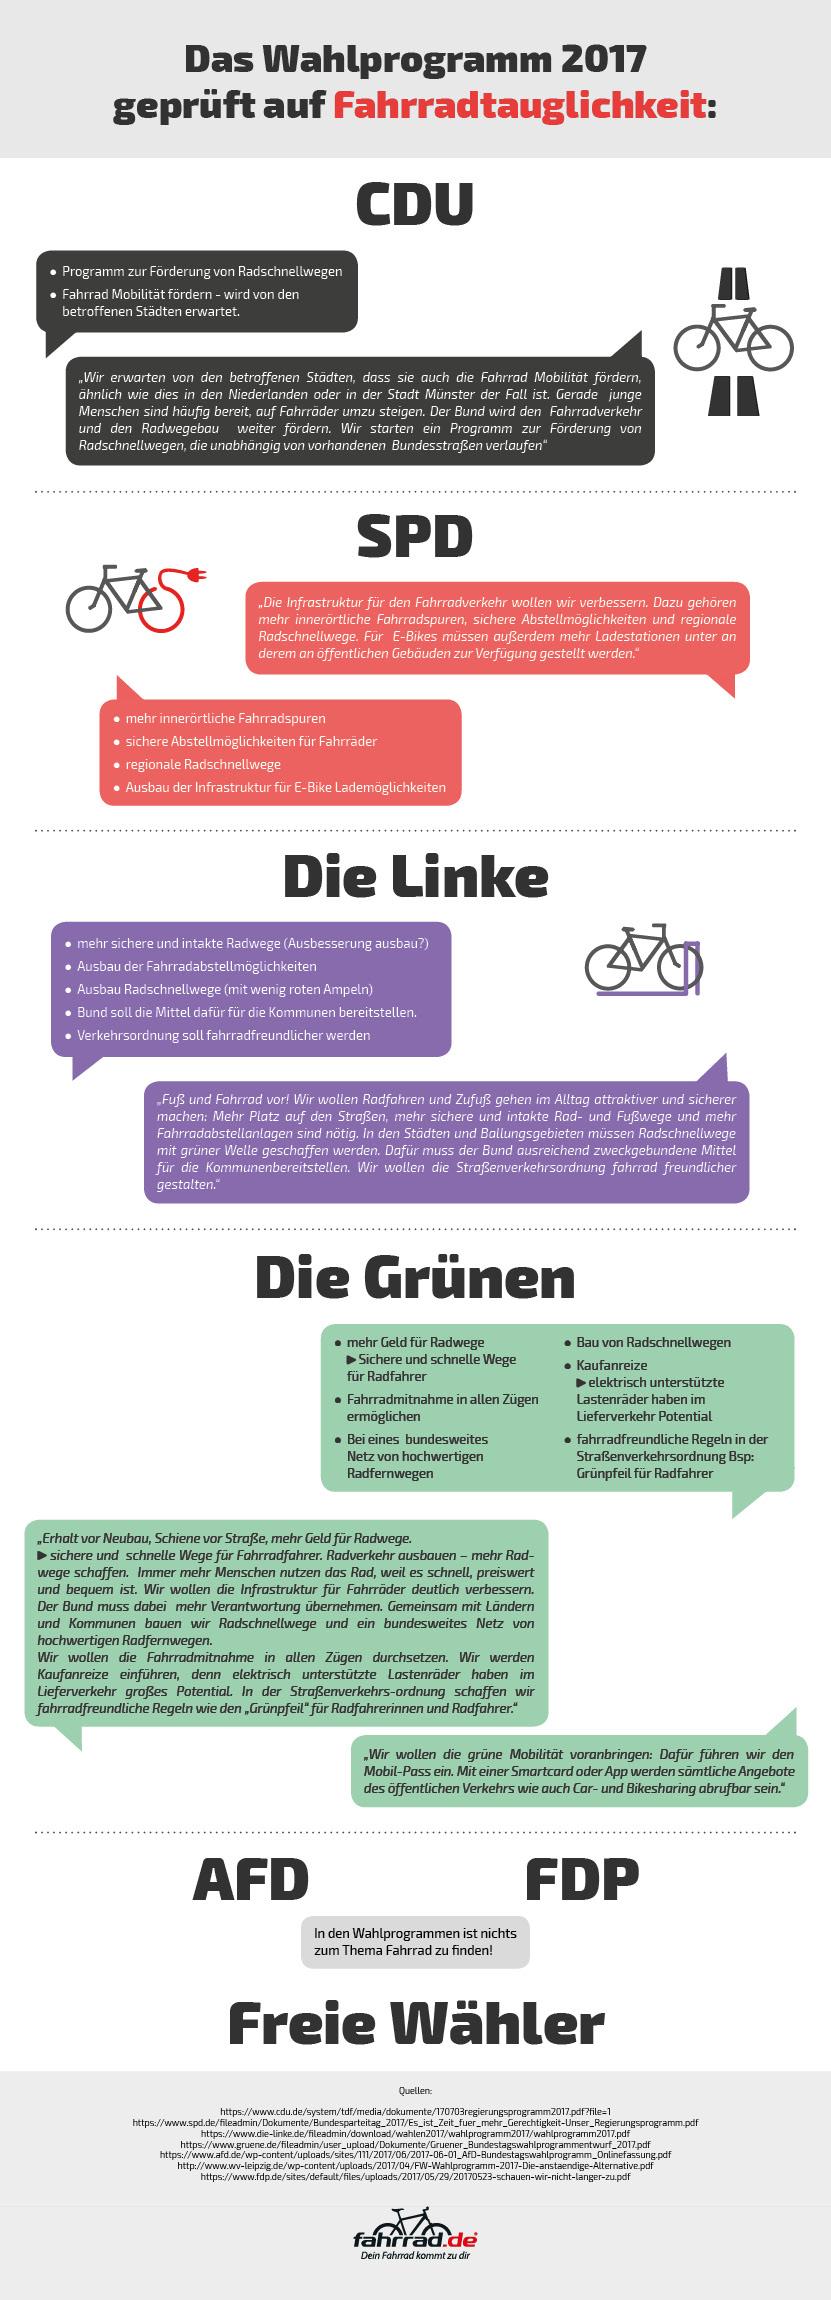 Wahlprogramm für Radfahrer - fahrrad.de